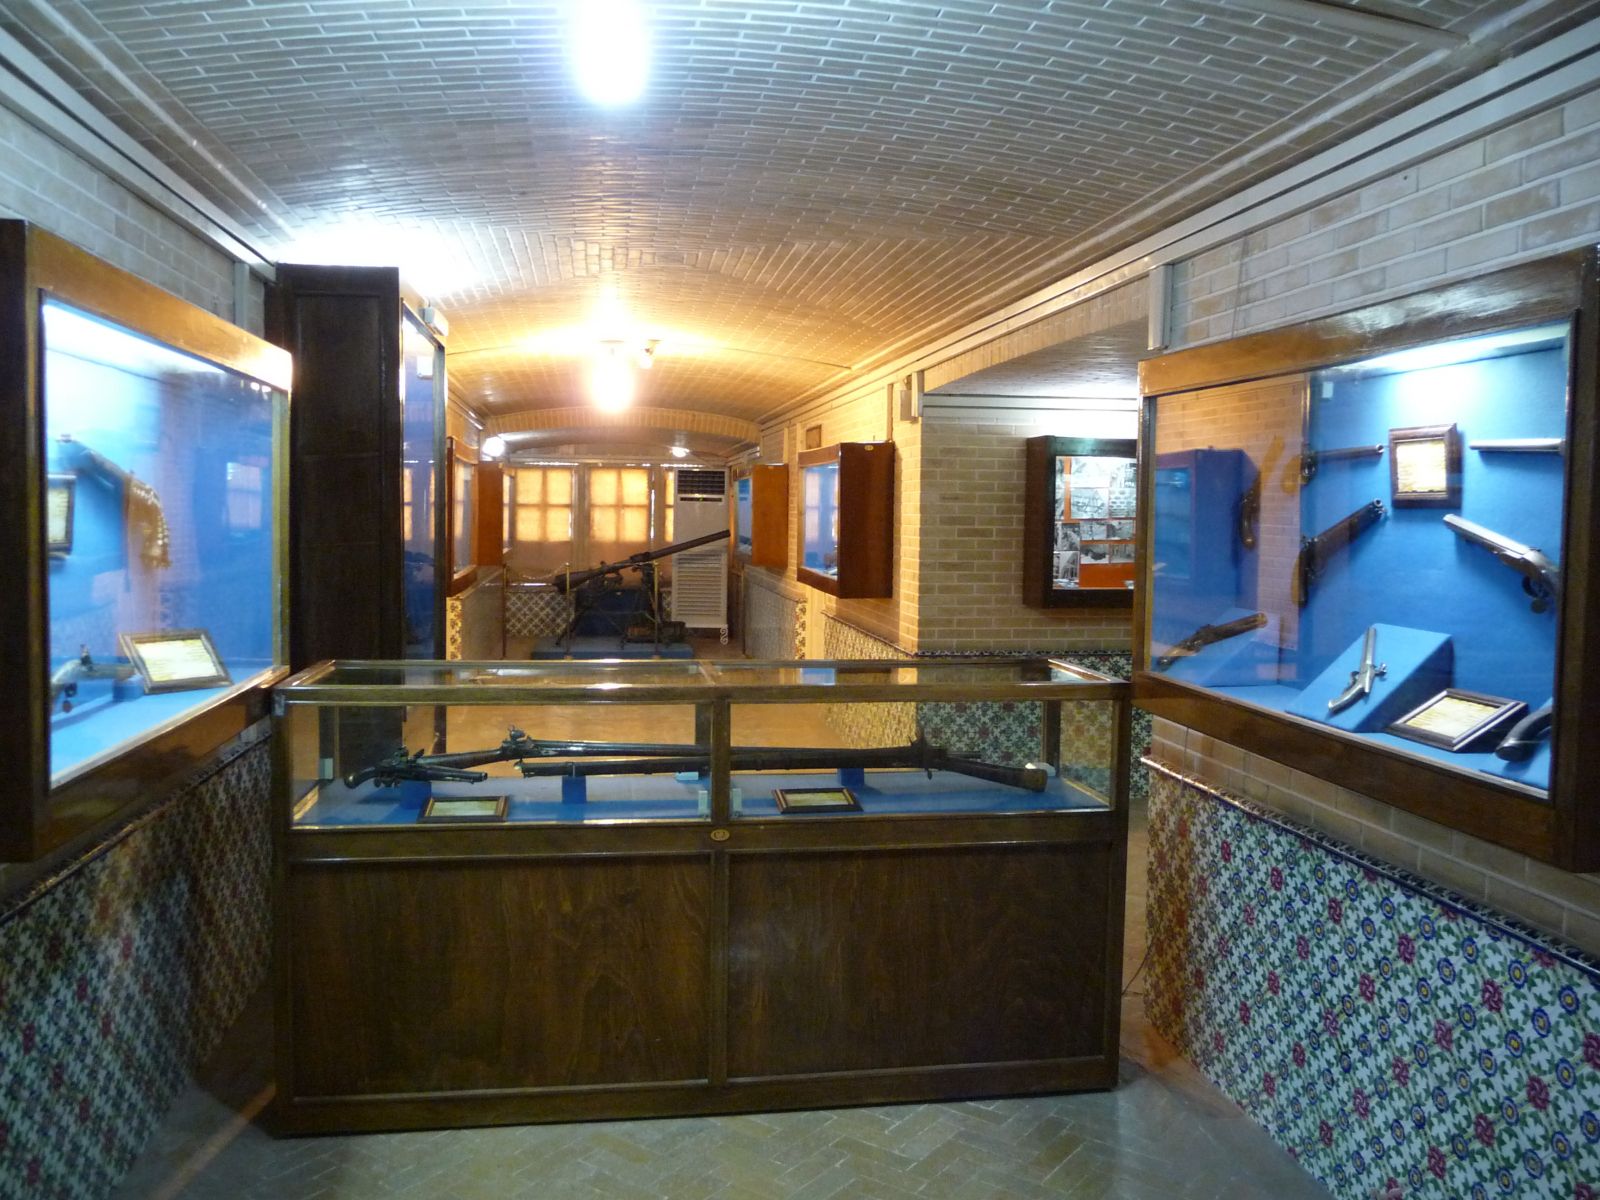 Baq-e Afifabad - Museum - Muskets Pistols